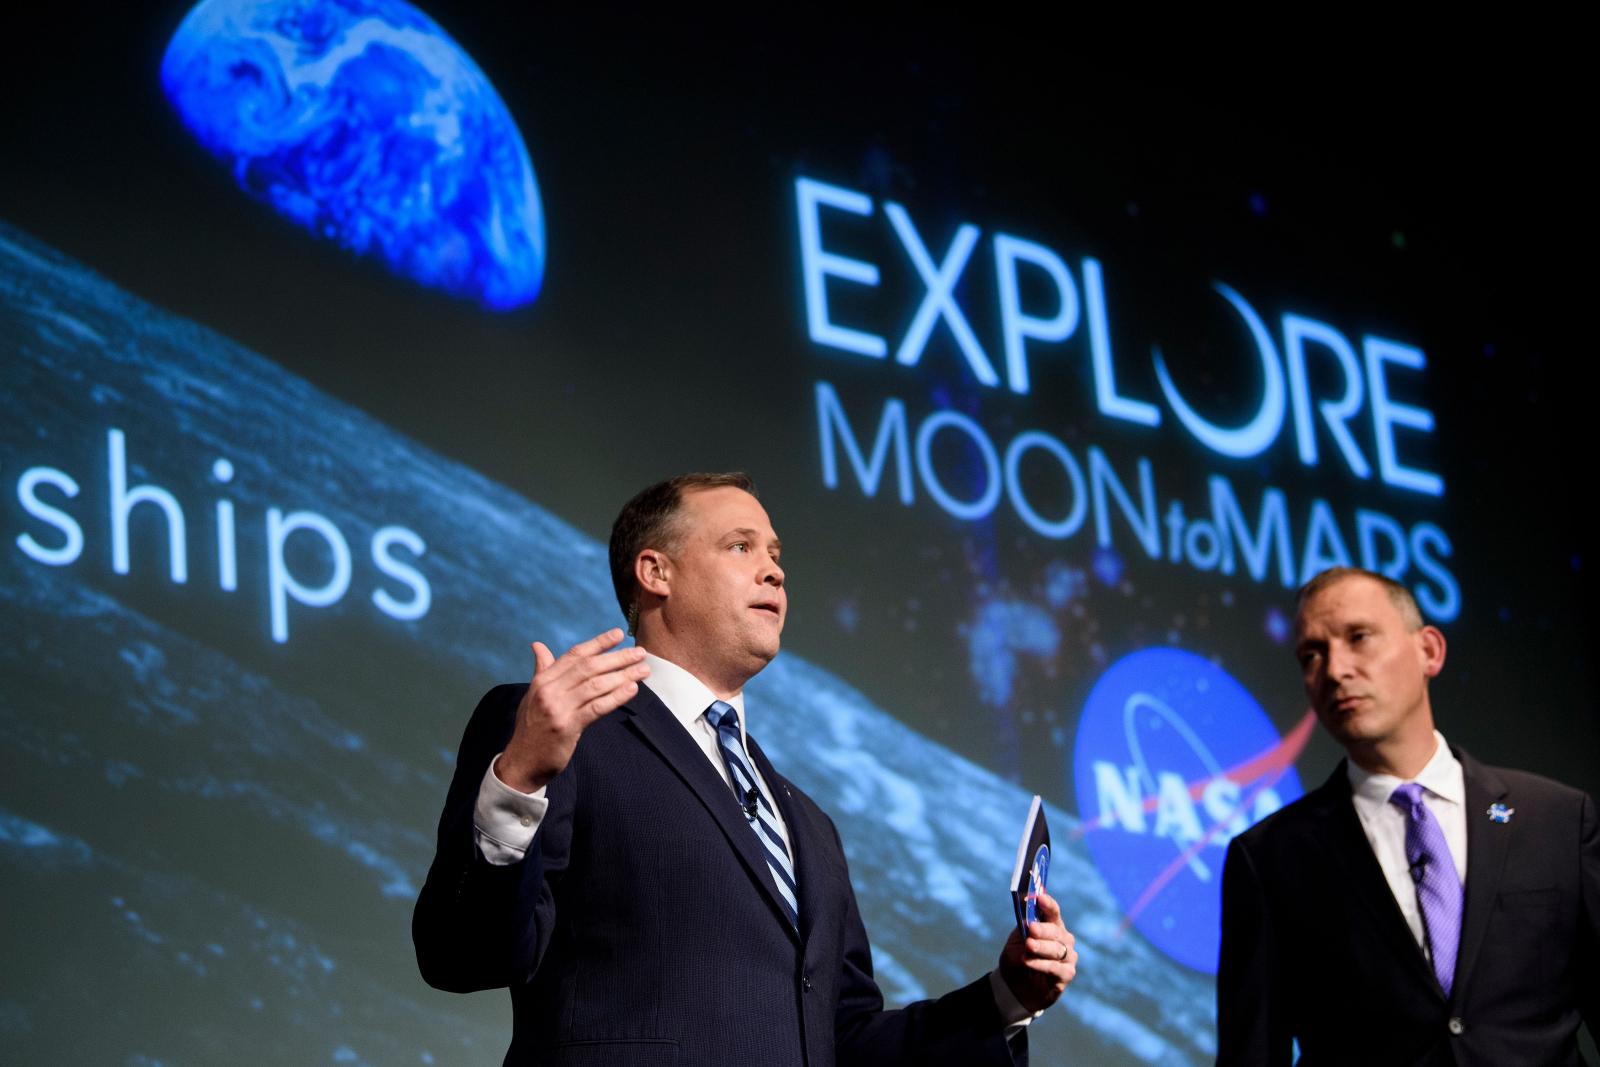 NASA Corporate Partnerships